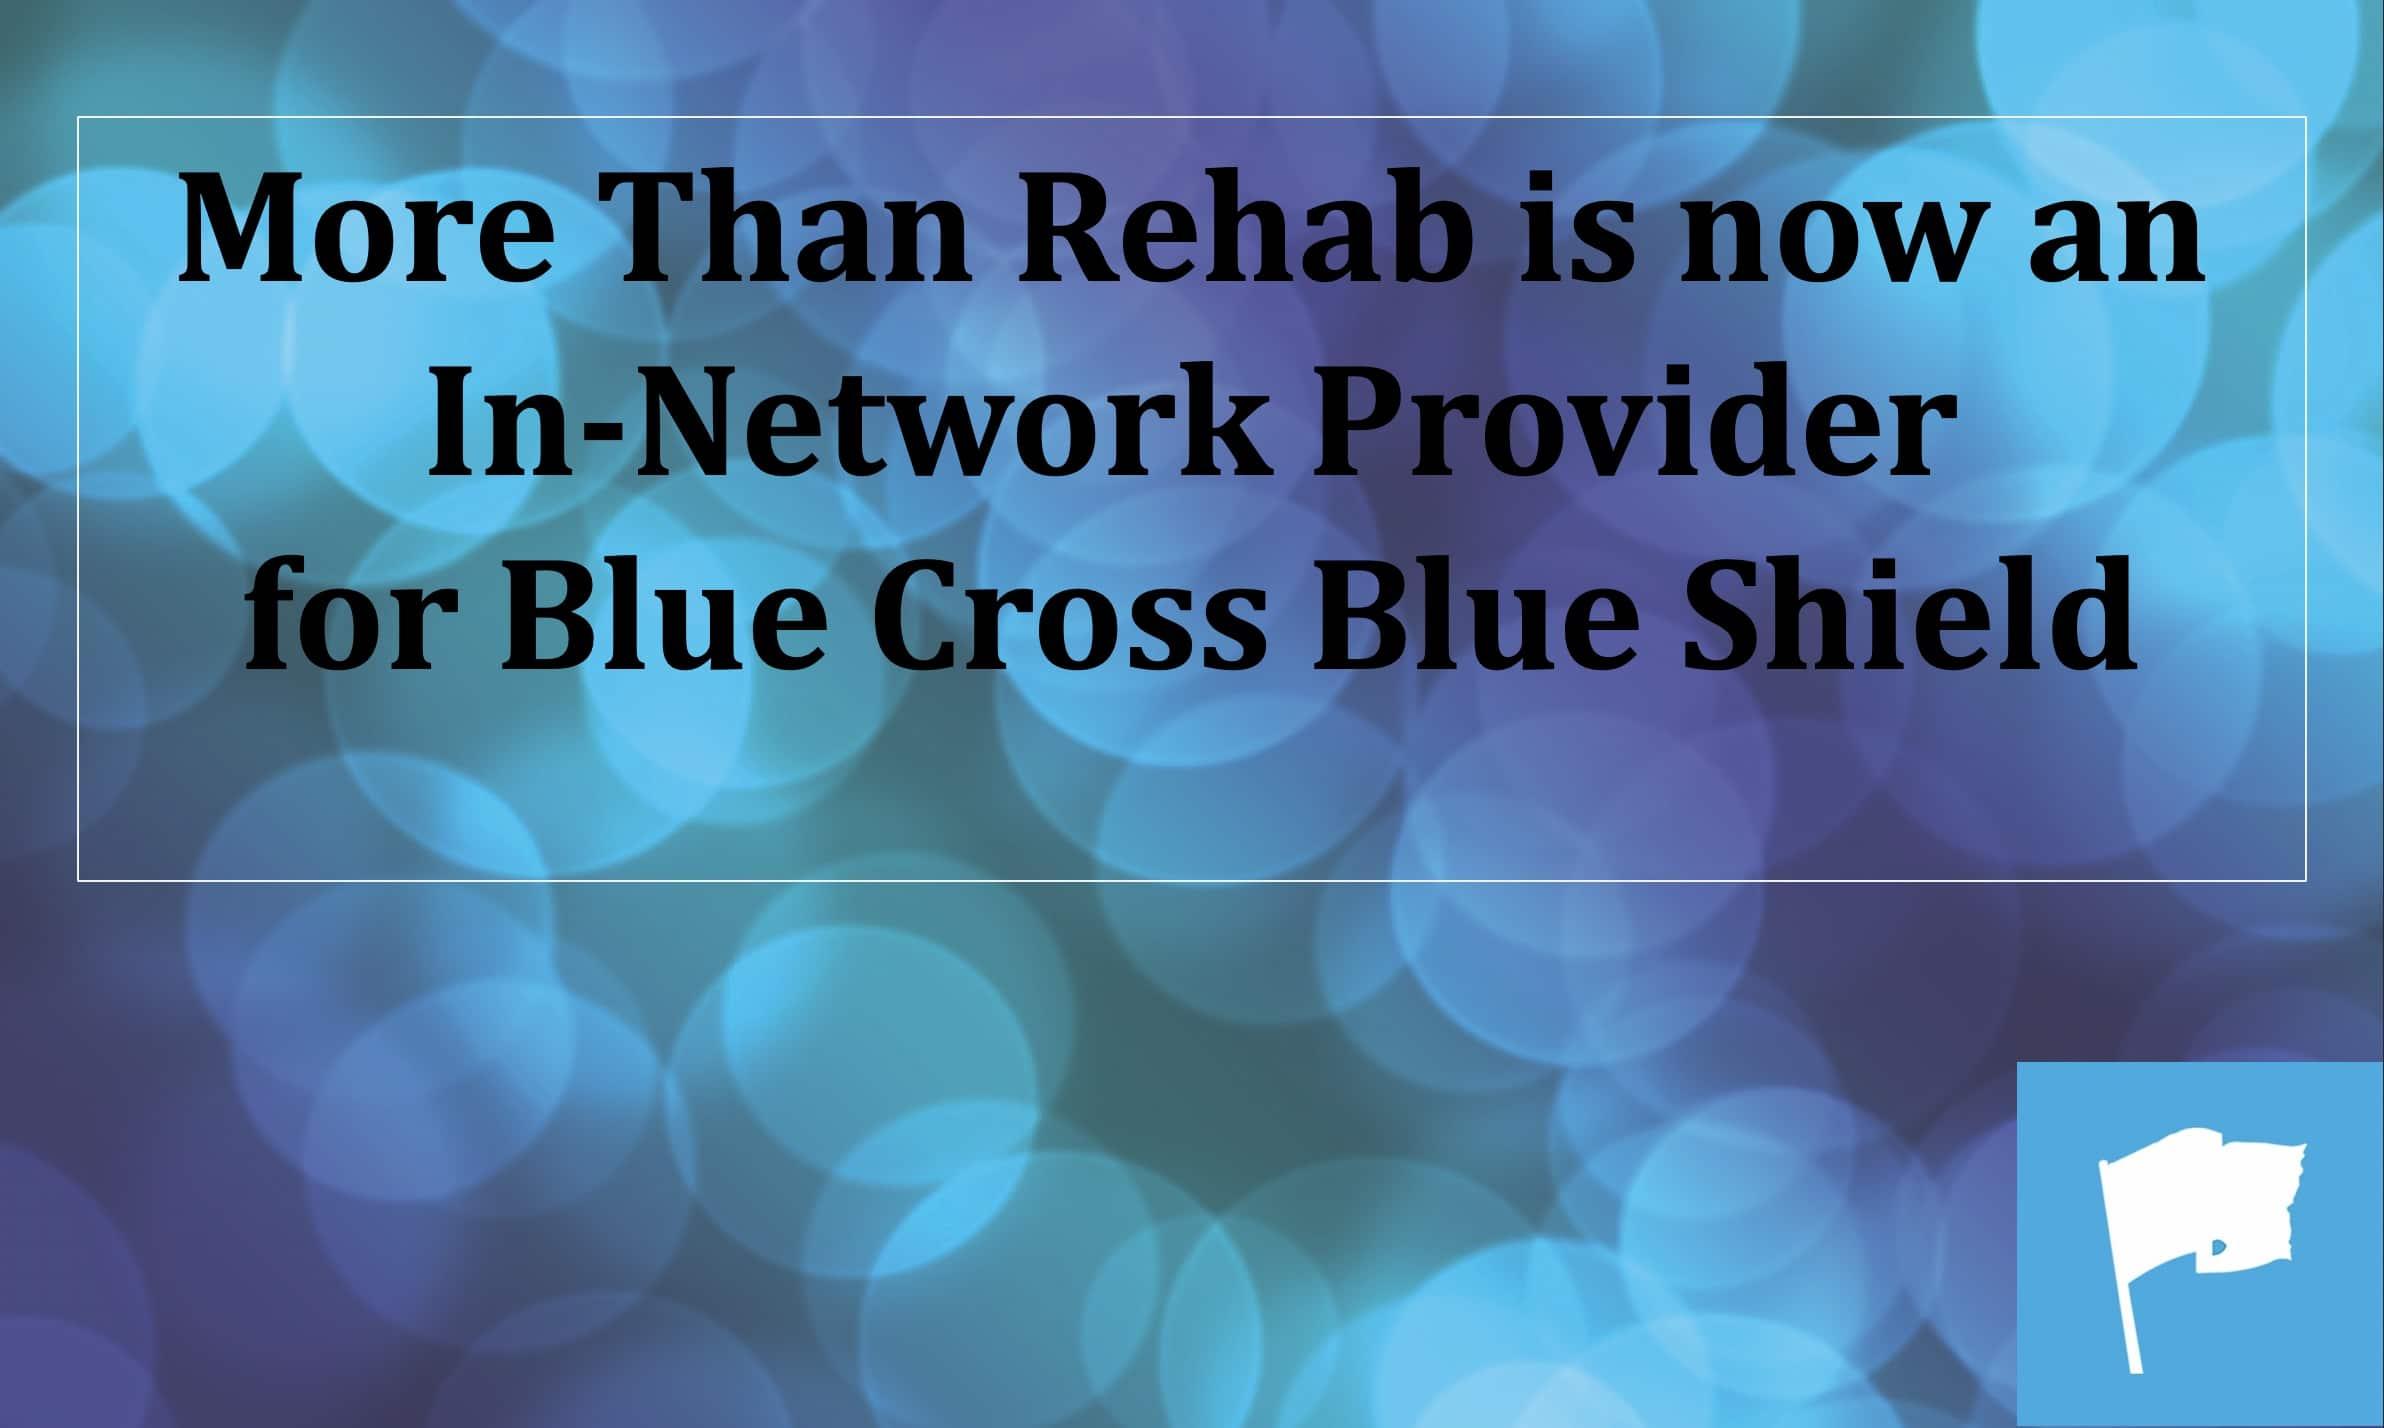 blue-cross-blue-shield-Houston-Texas-addiction-treatment-alcohol-drug-rehabilitation